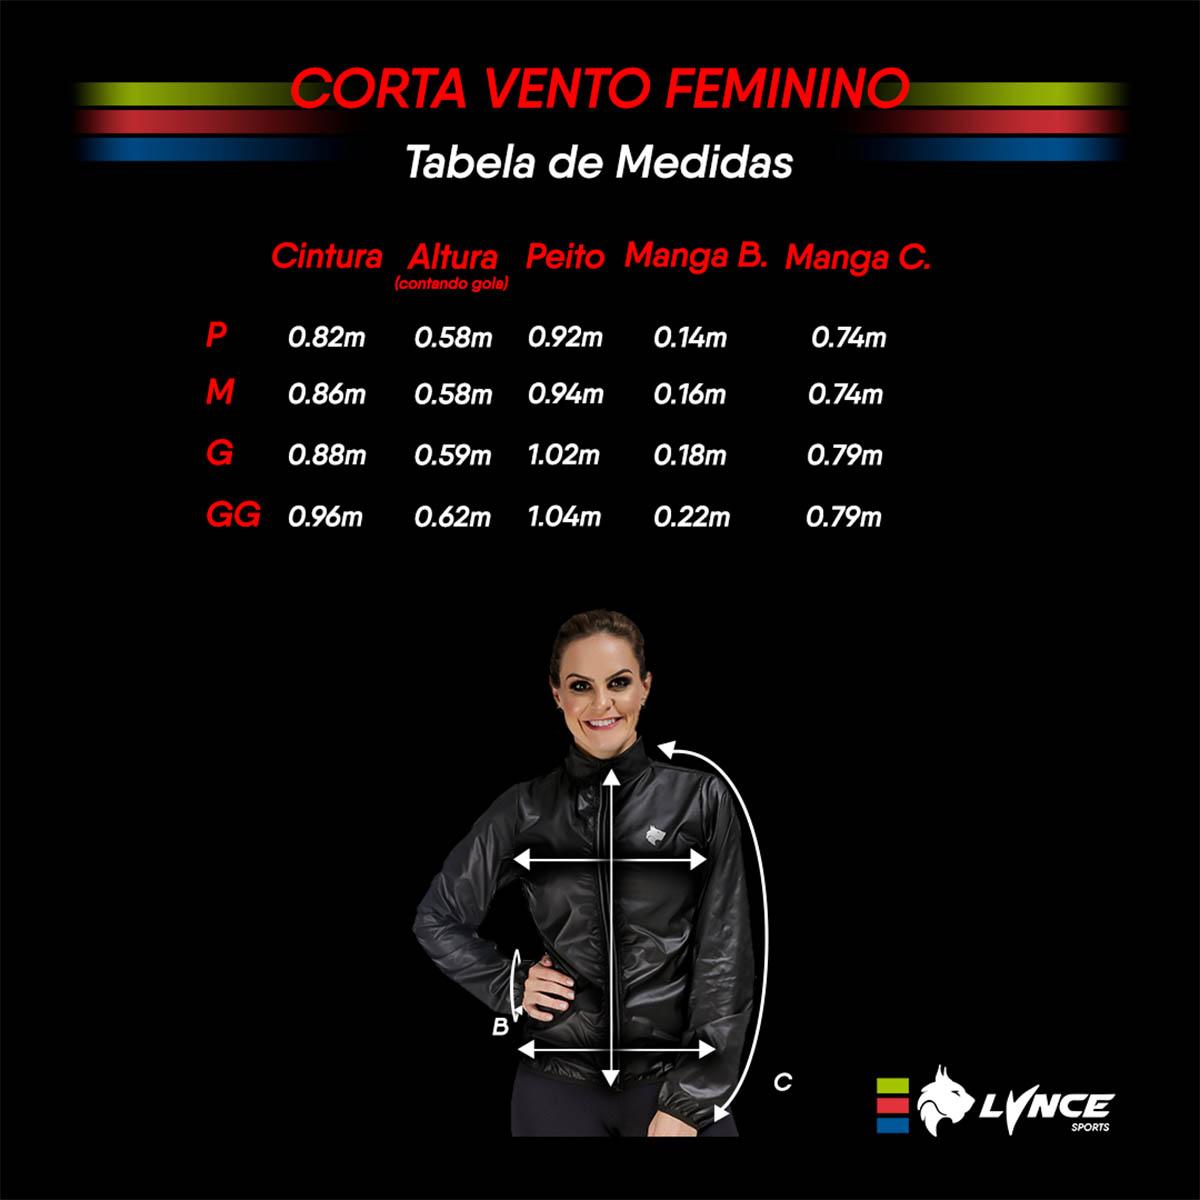 Jaqueta Corta Vento Lynce Feminina Rose Titanium com Ziper Refletivo Rosa Nude Ciclismo